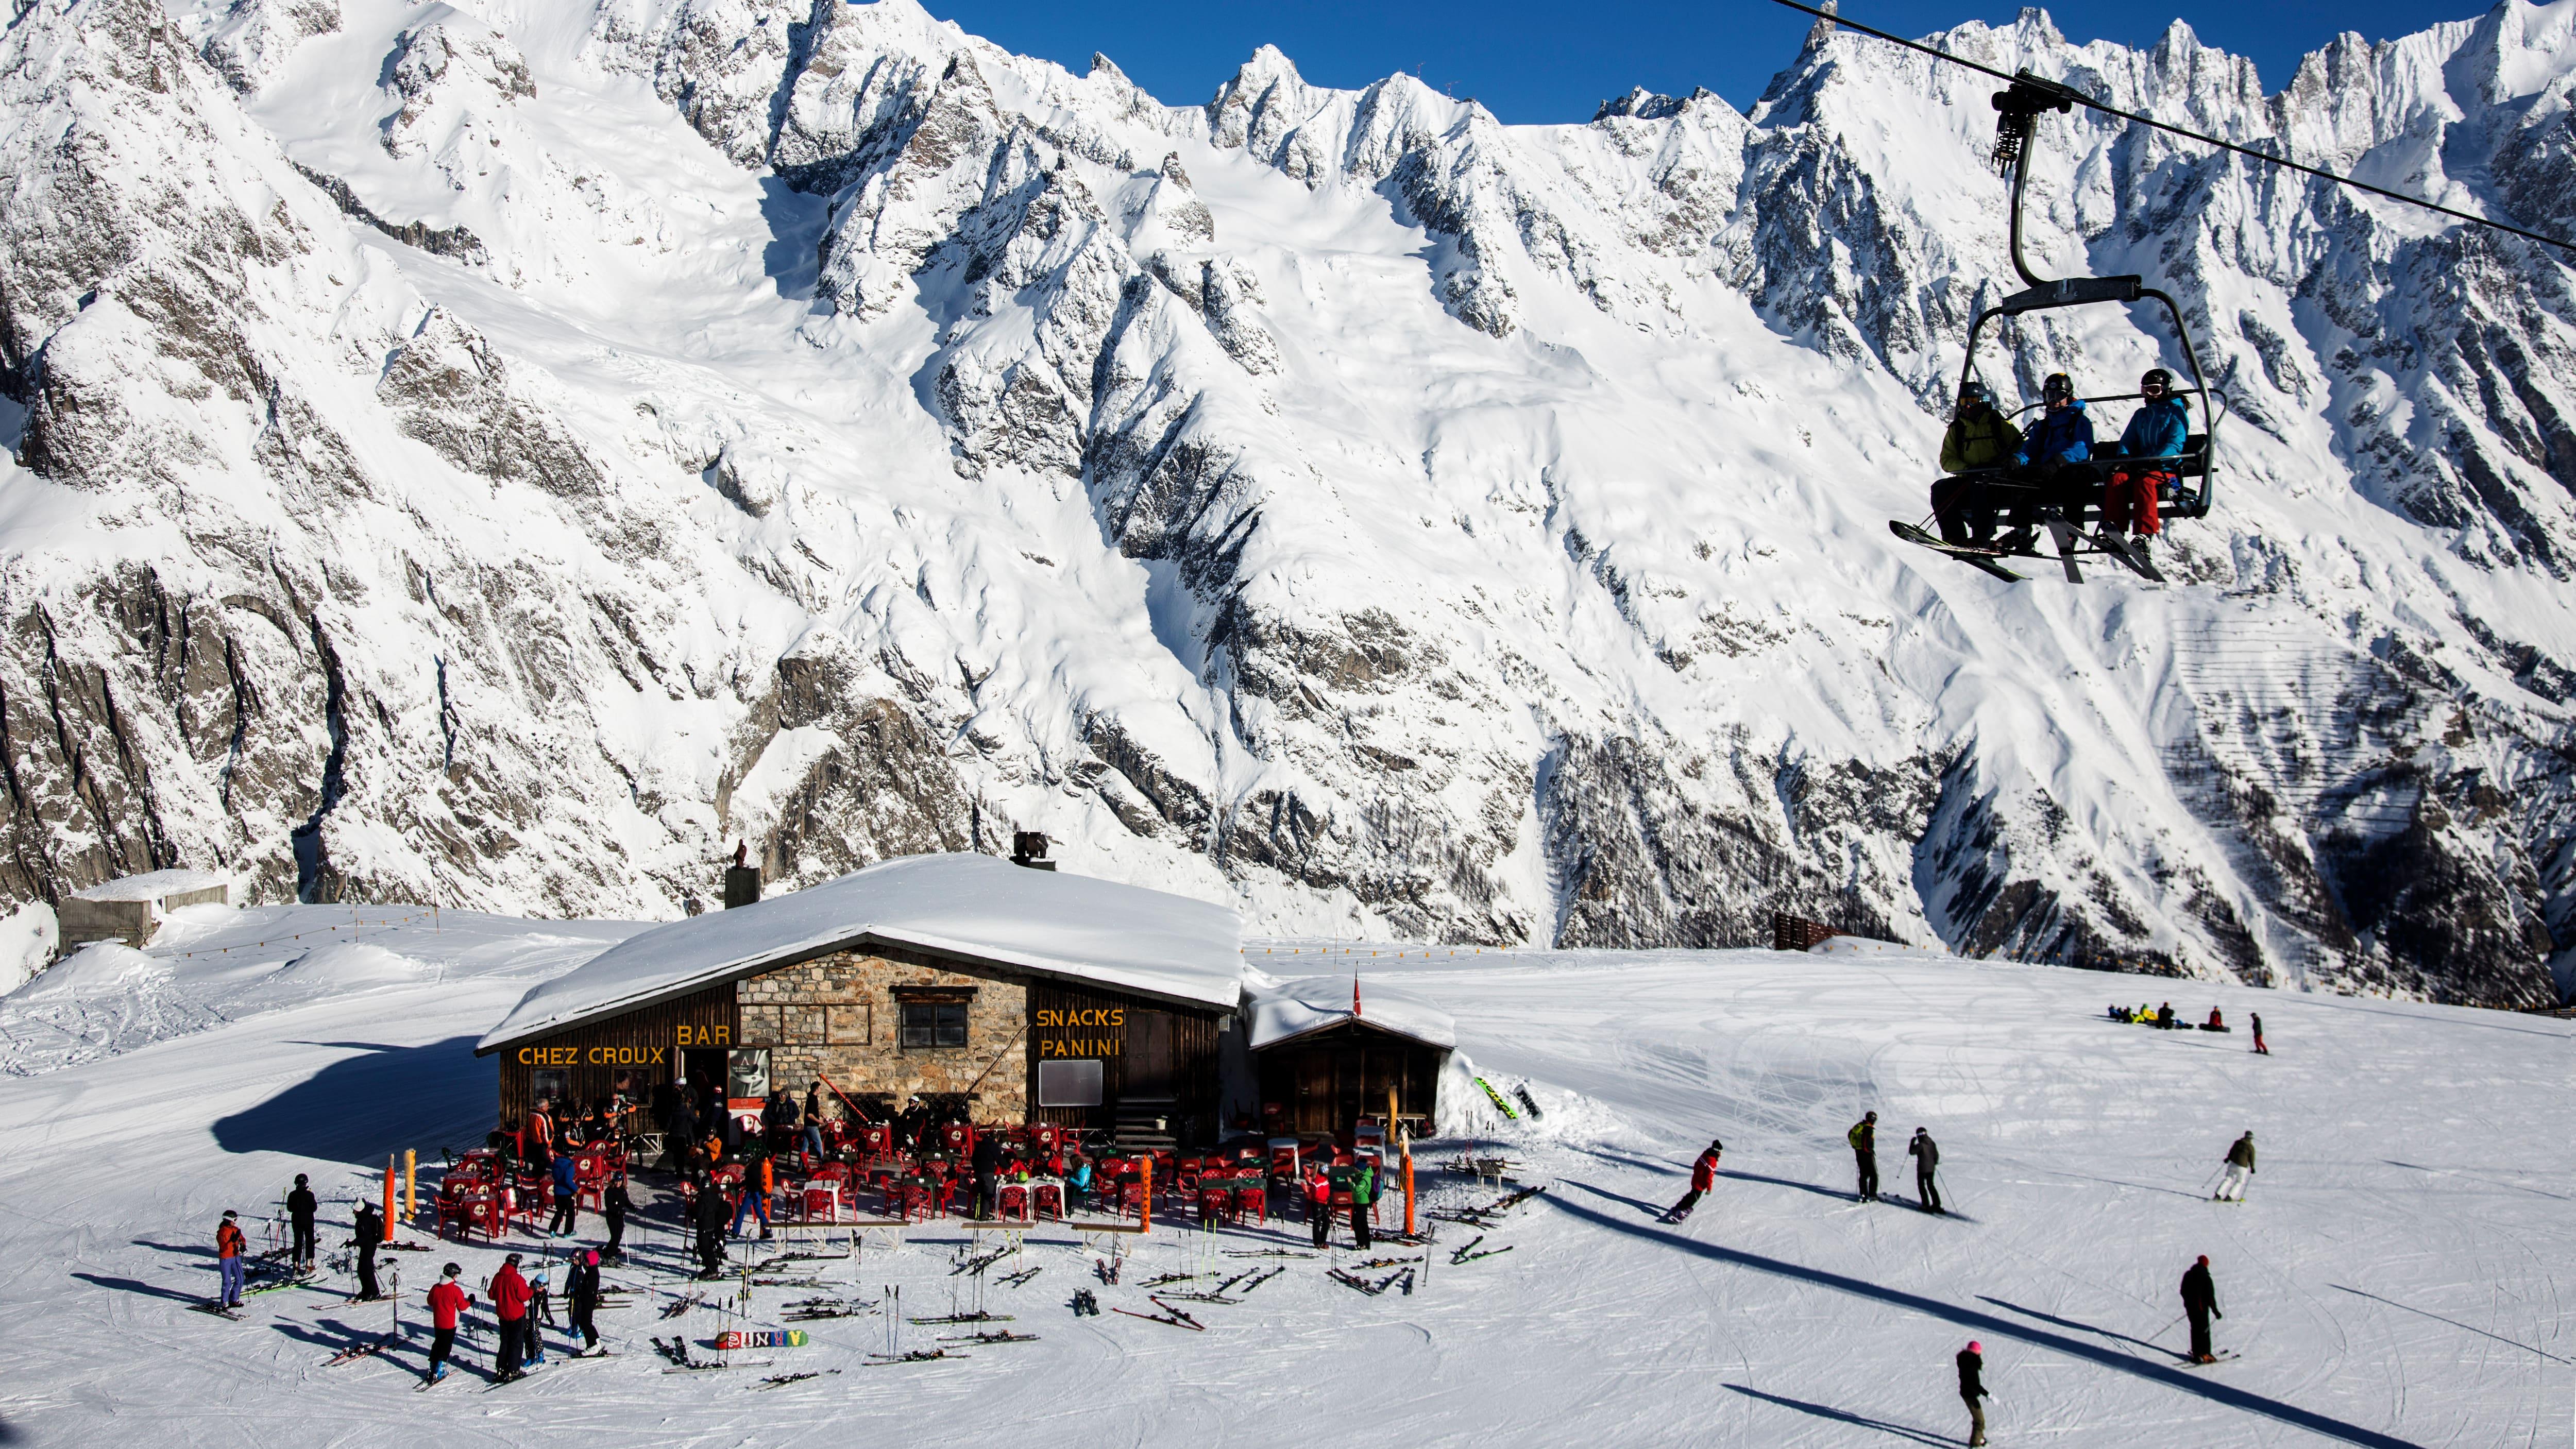 Mountain restaurant in Courmayeur